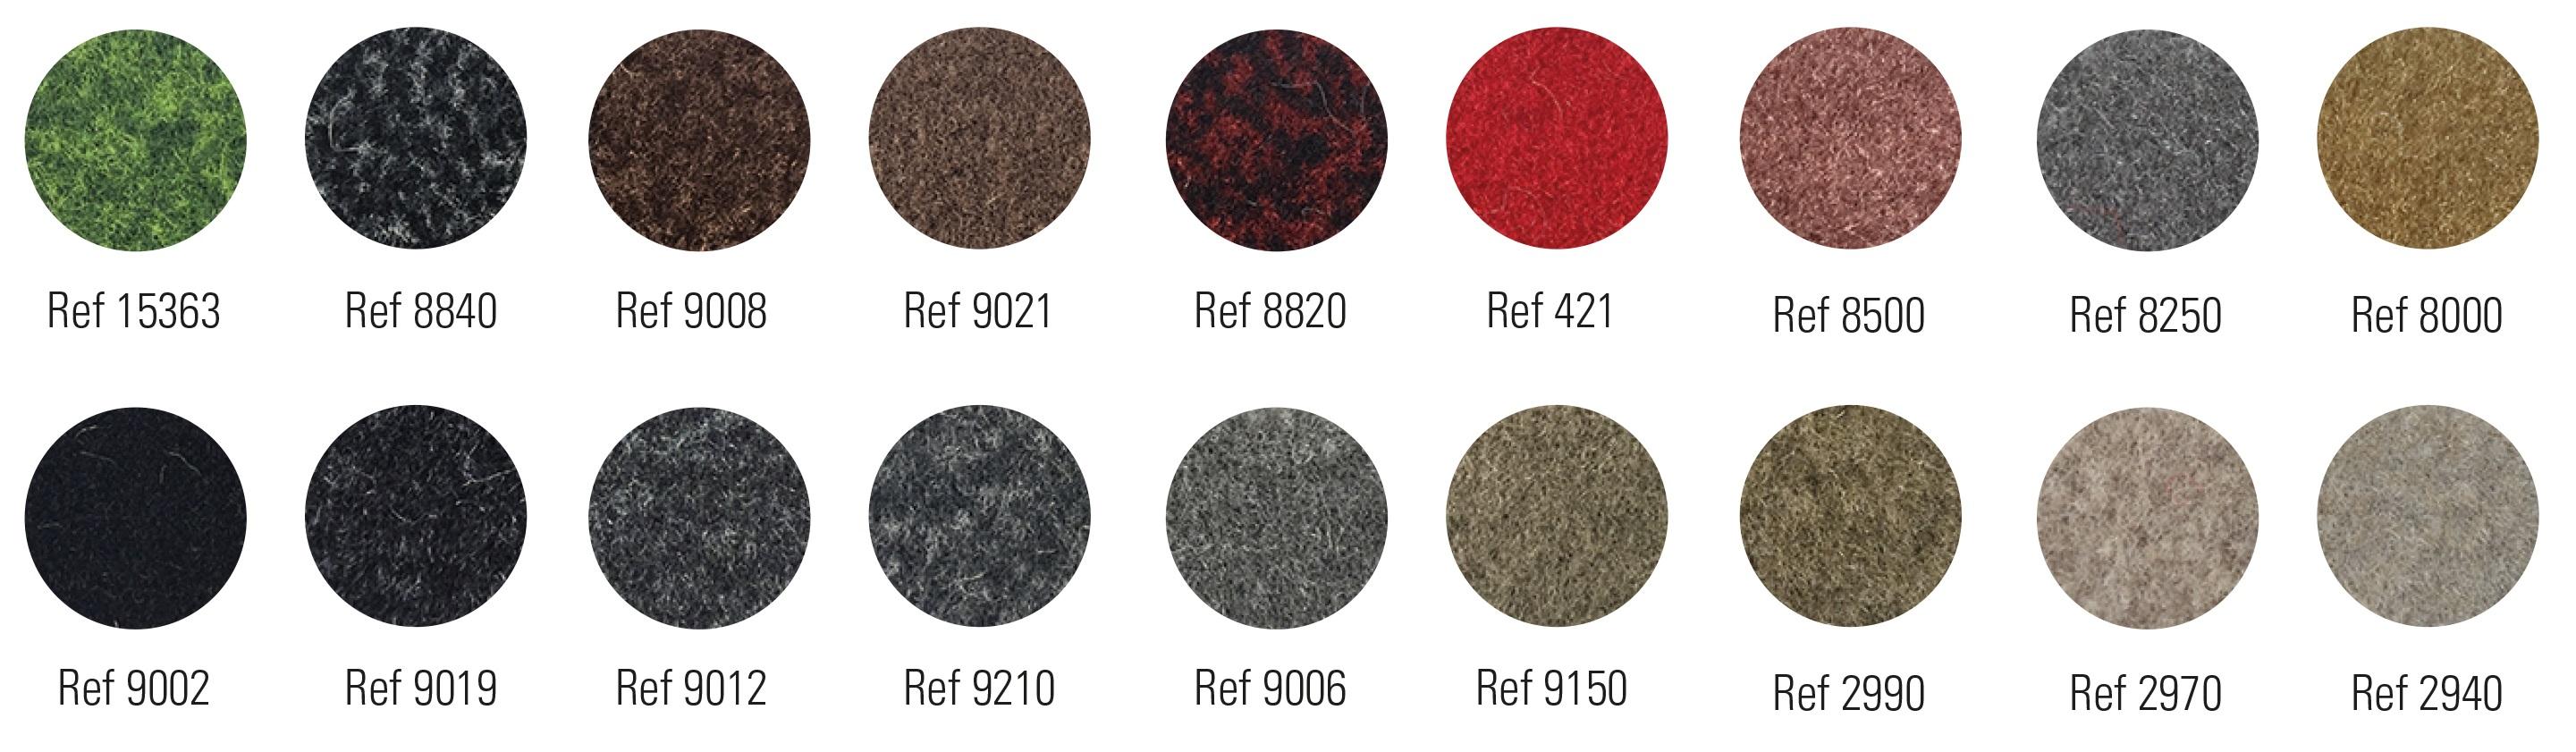 Verimpex-CleanMid-kleurreferenties5acbaf8659e6f